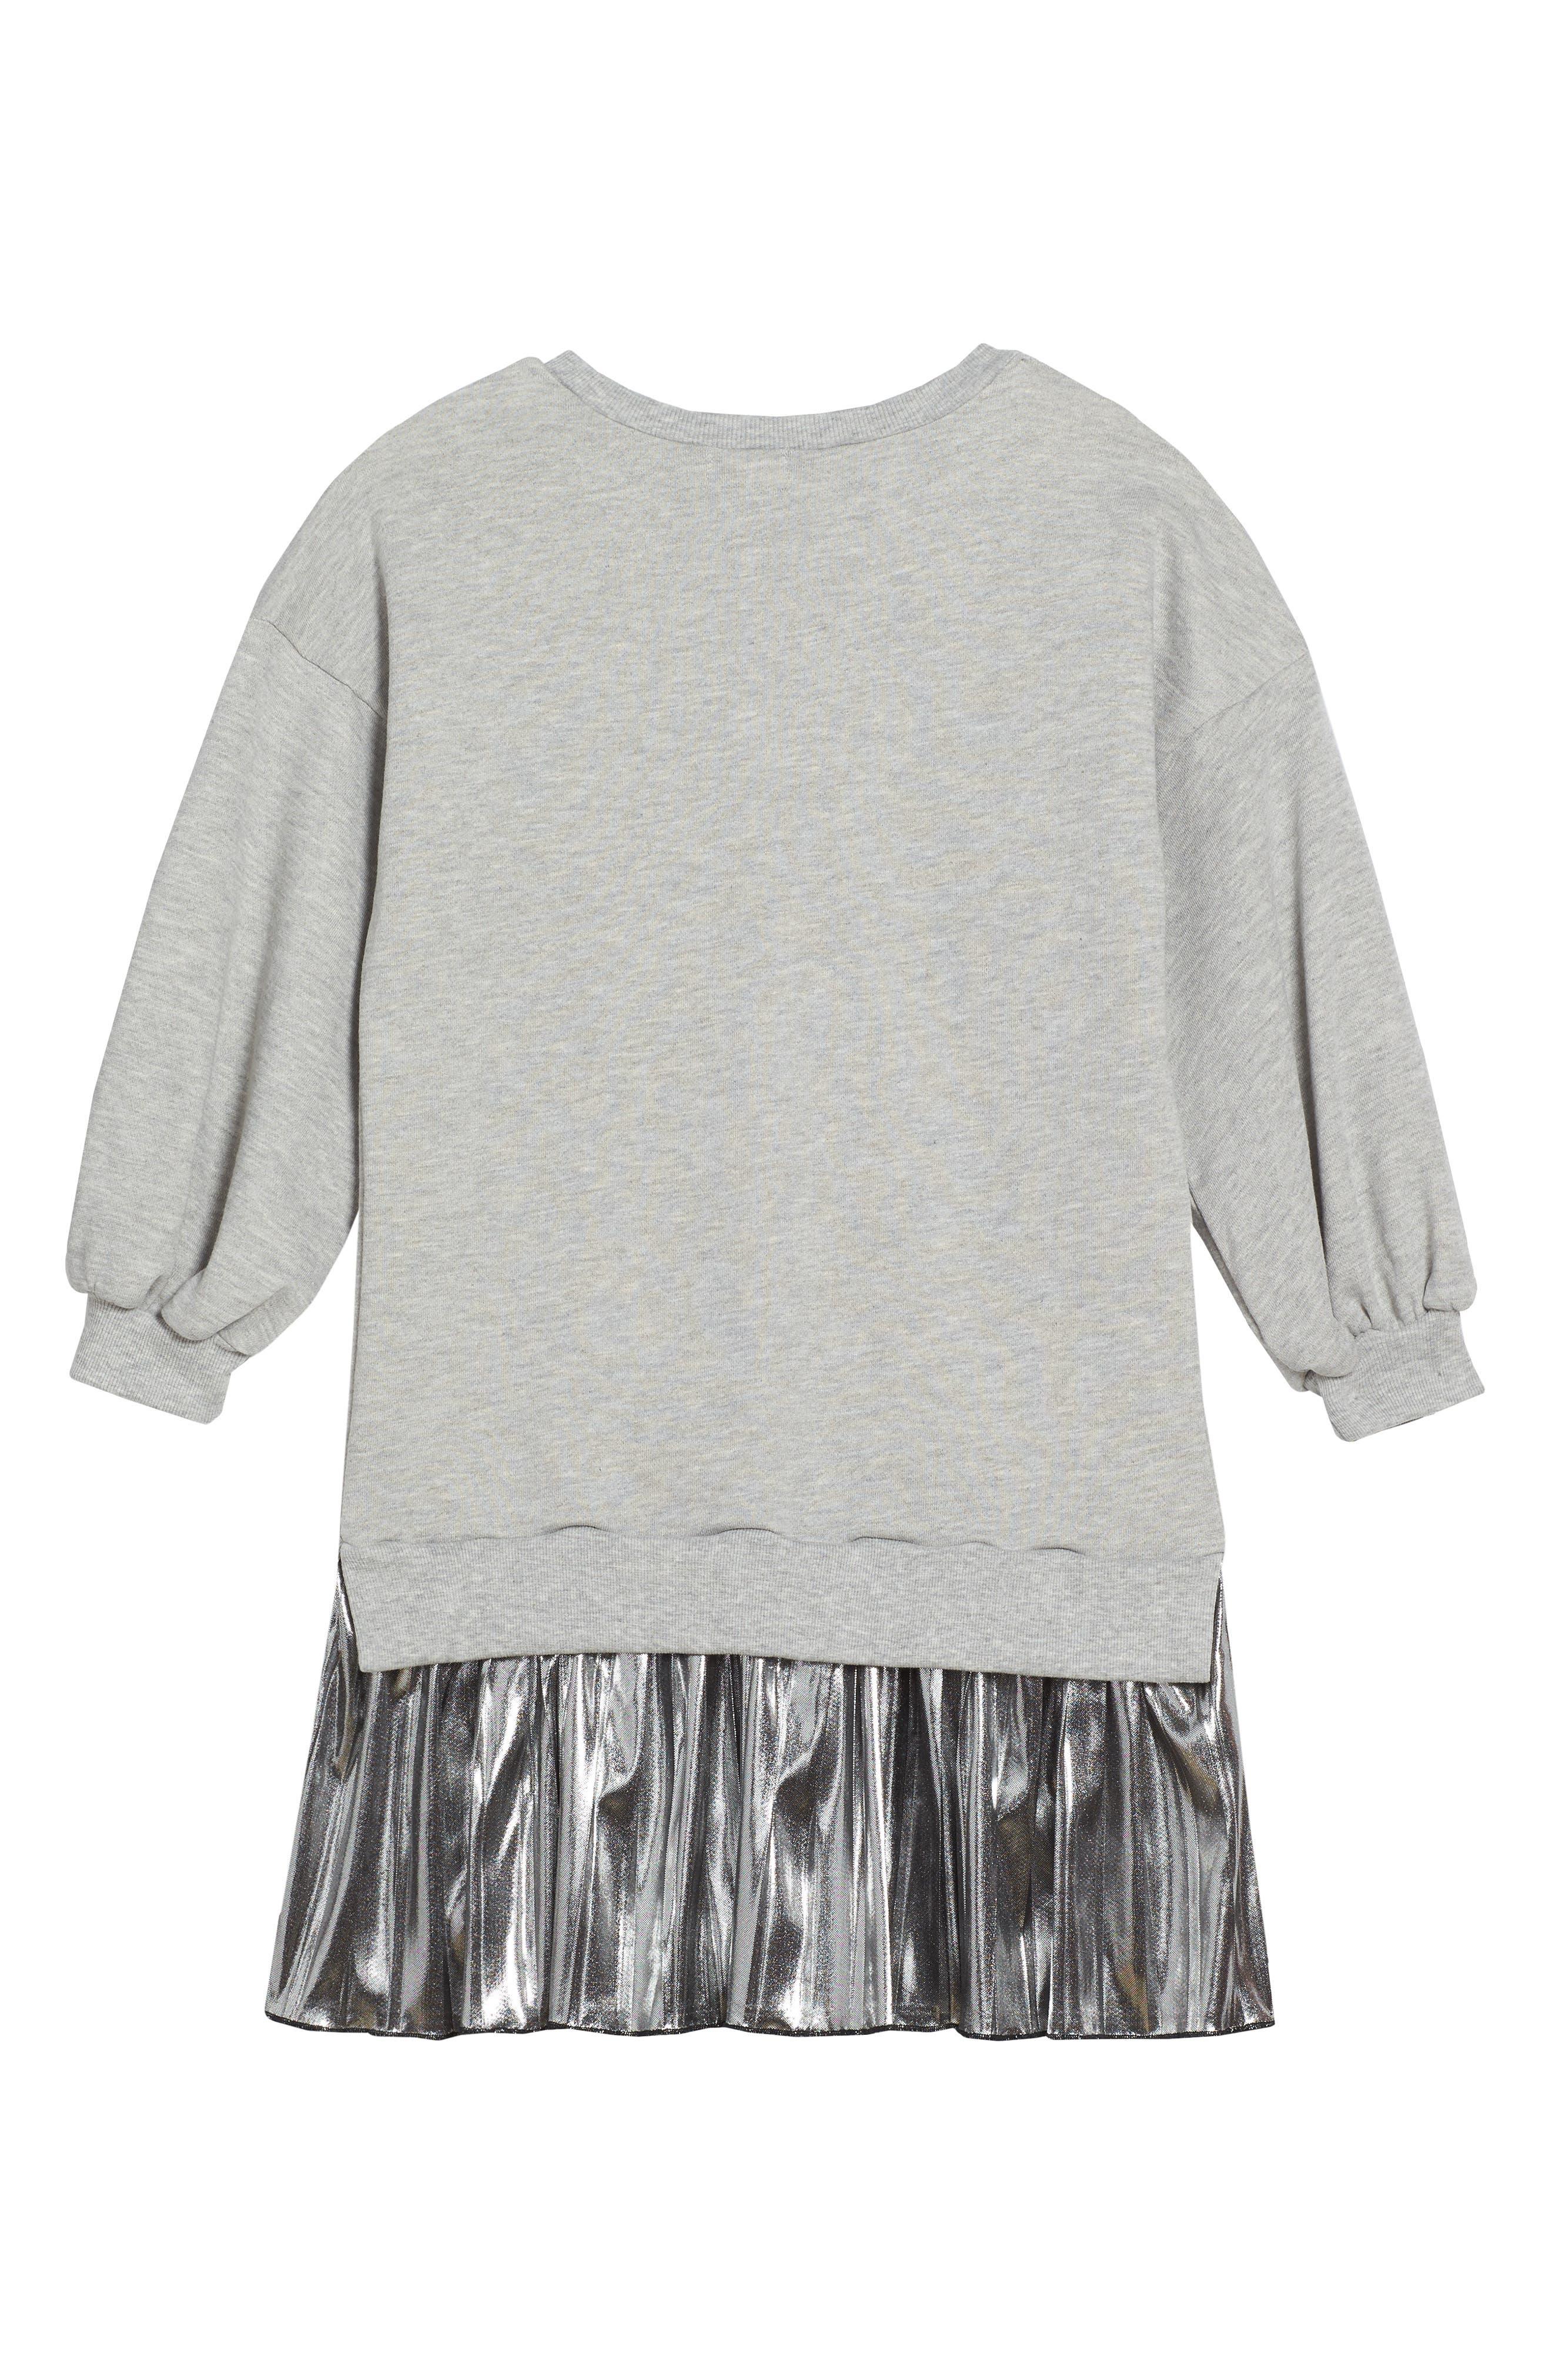 Metallic Sweatshirt Dress,                             Alternate thumbnail 2, color,                             Grey